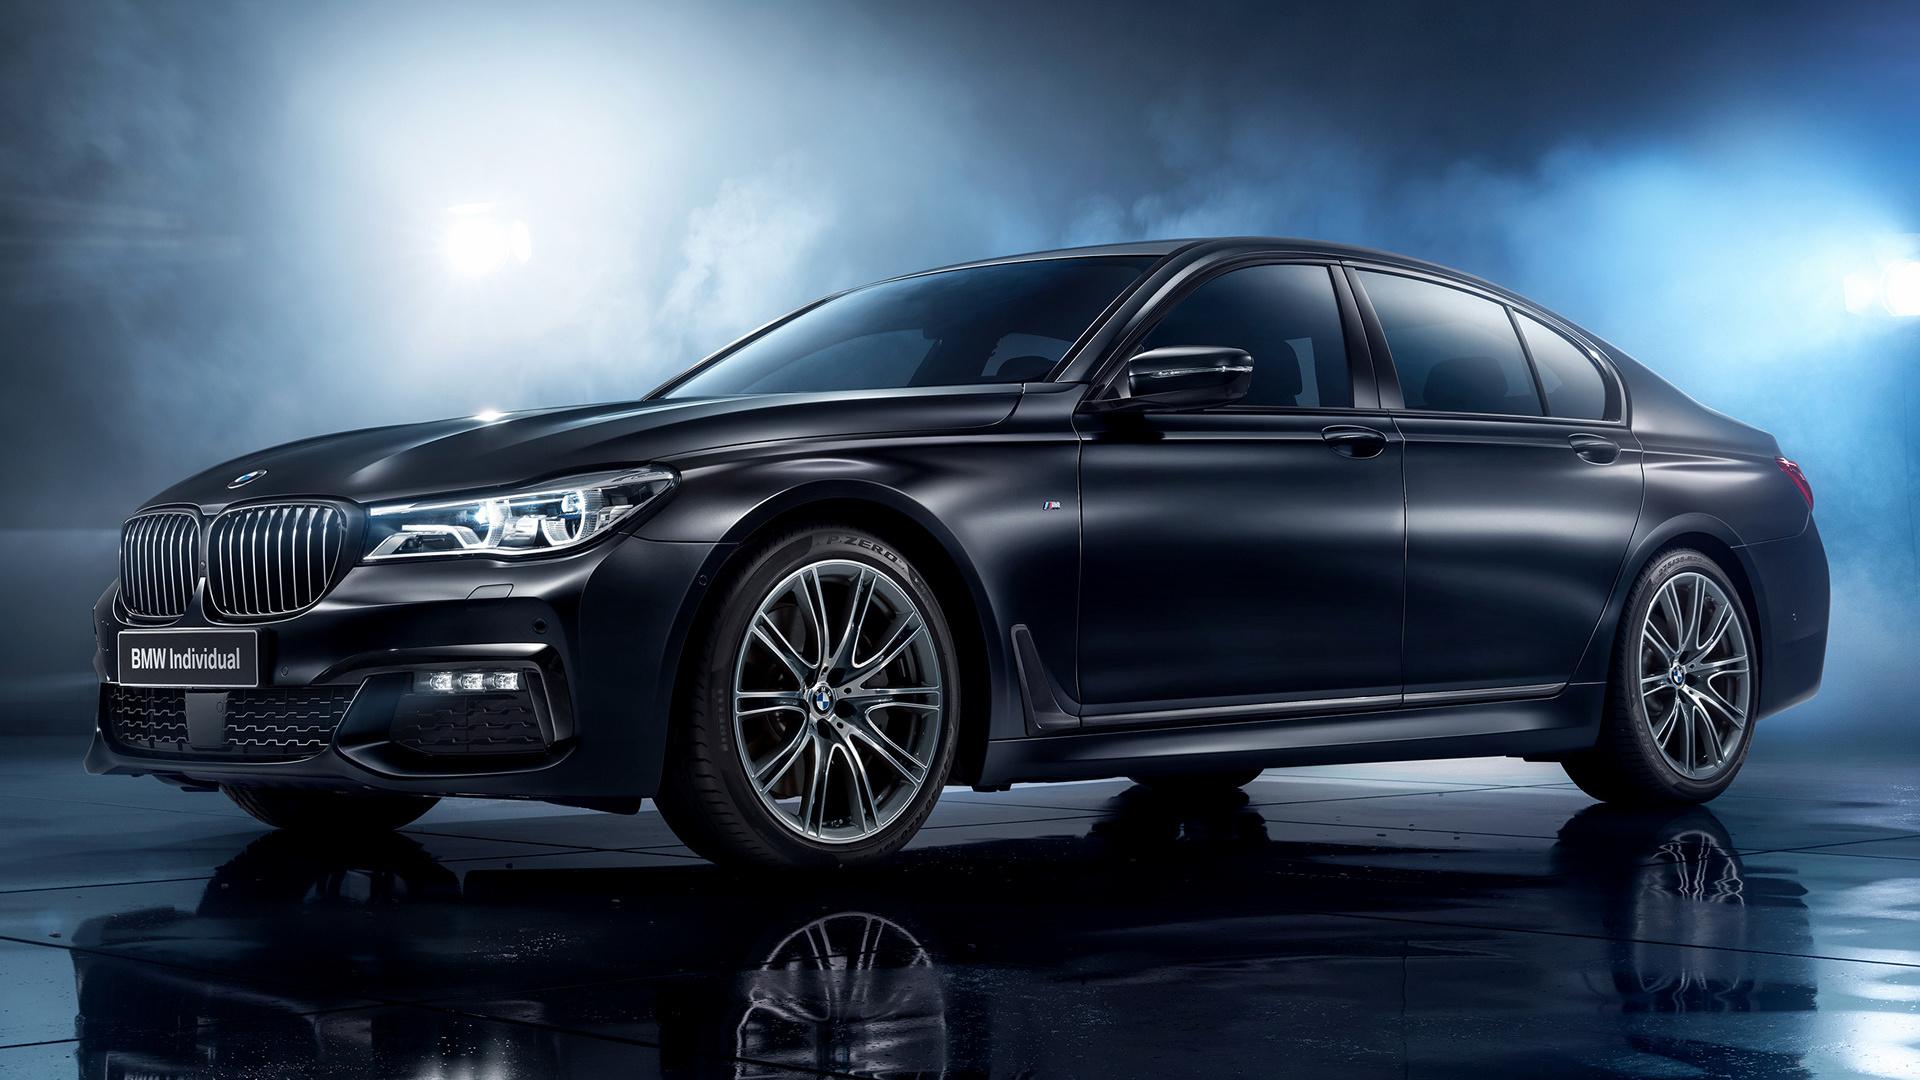 2017 BMW 7 Series Black Ice Edition HD Wallpaper ...